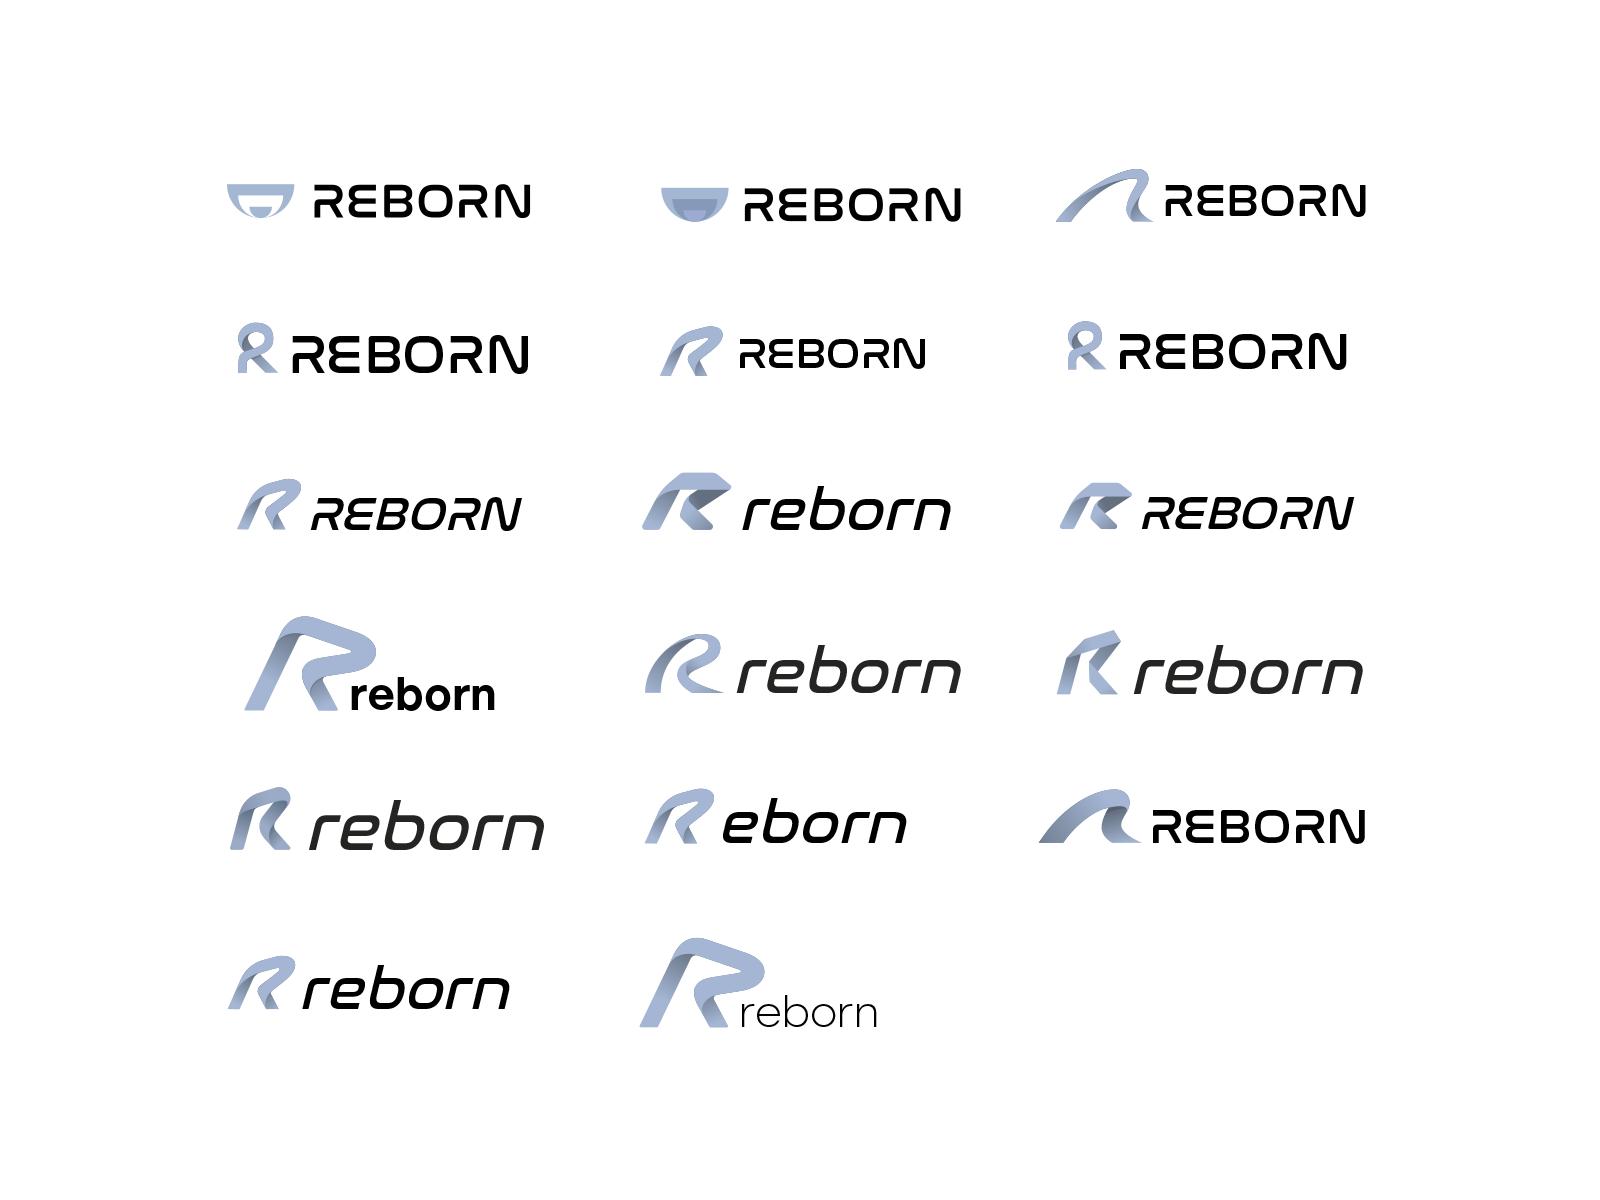 Reborn logo options design case study